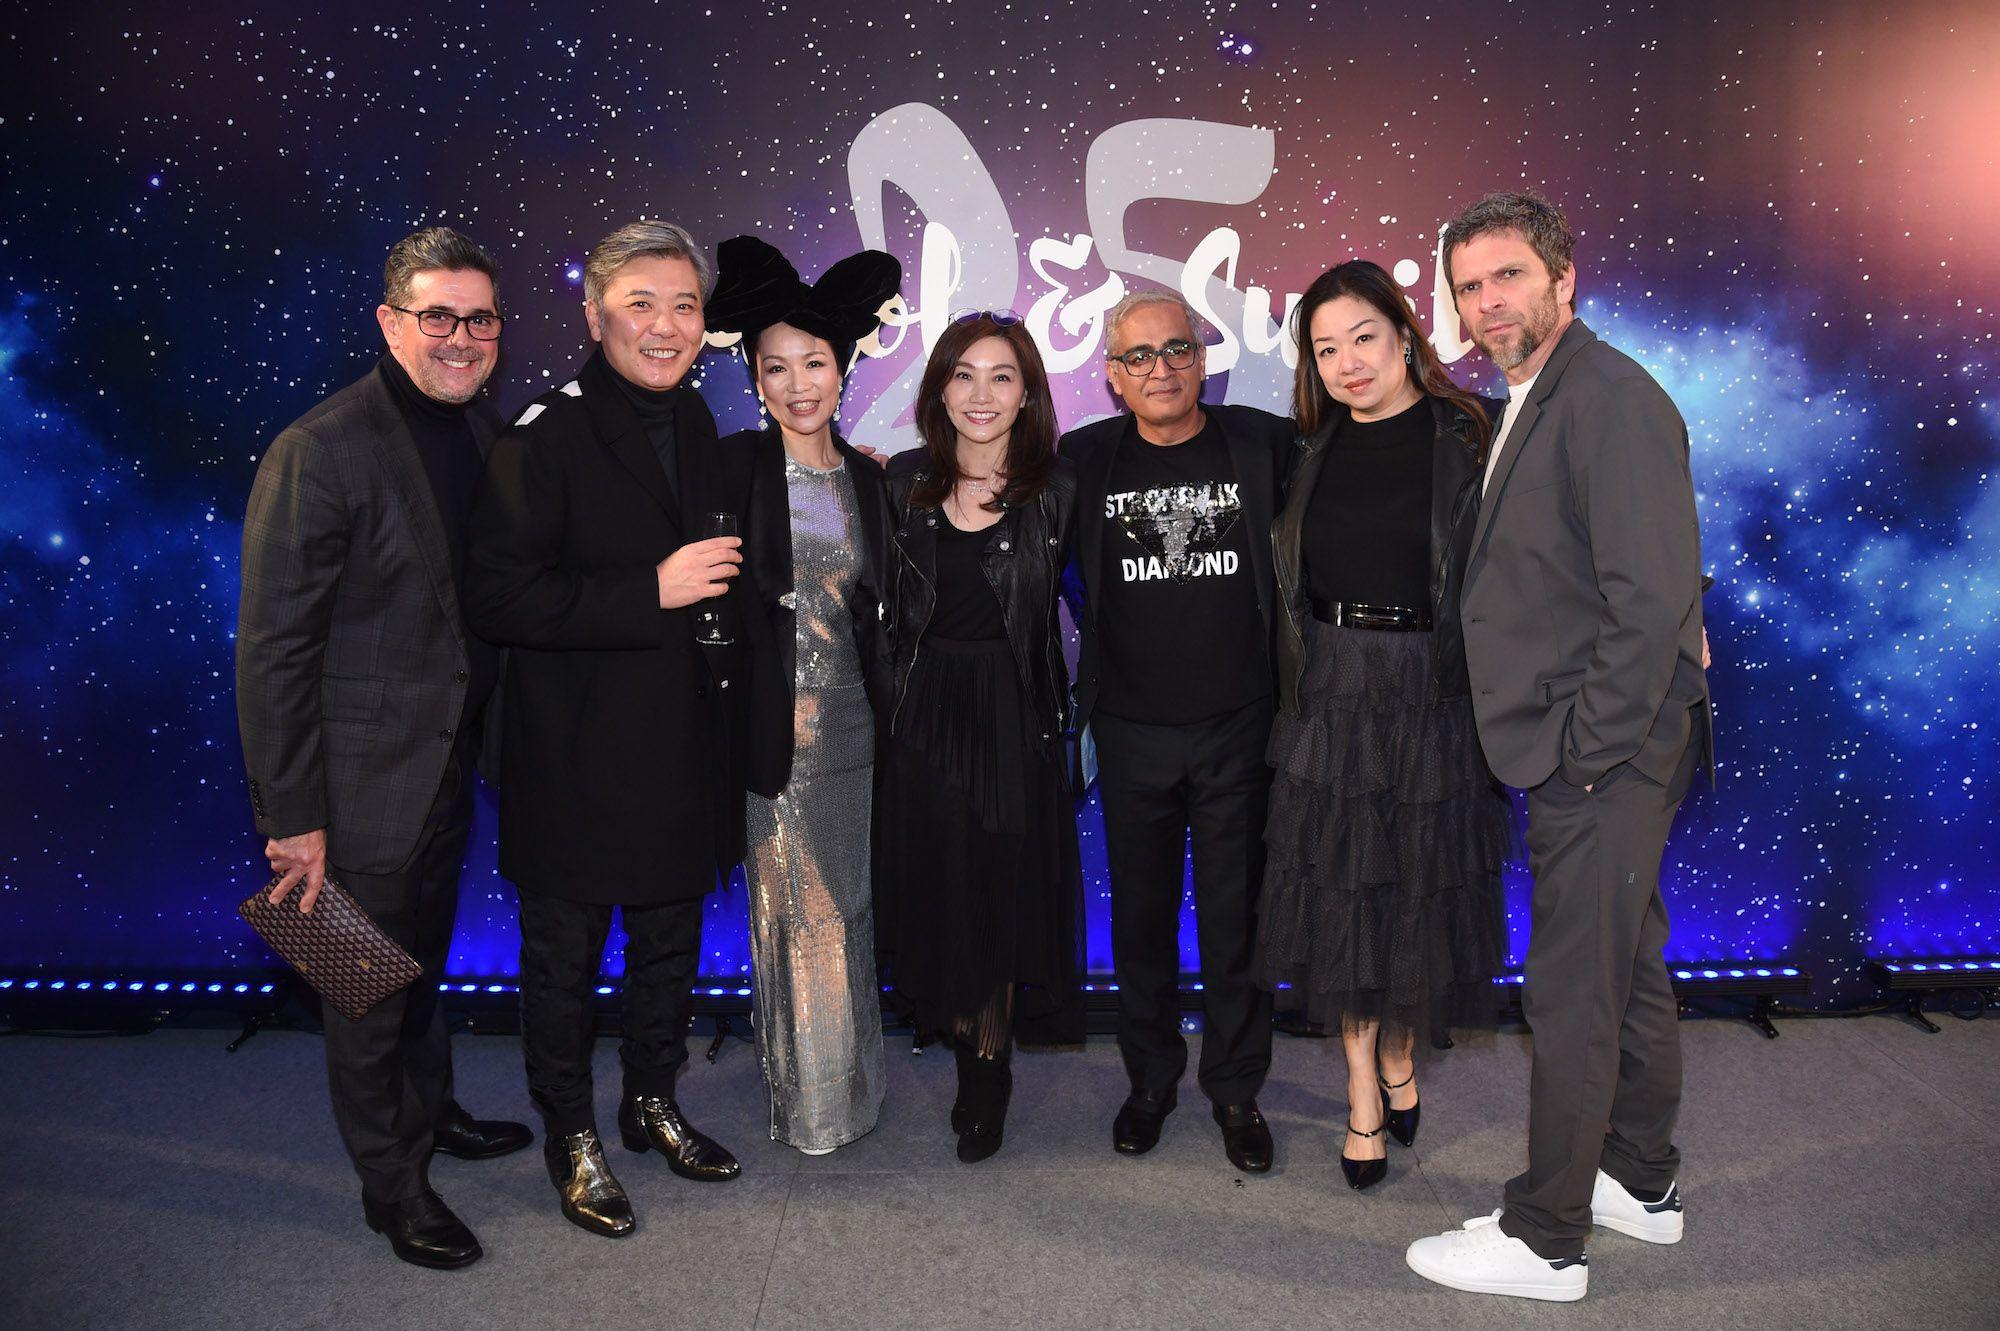 Francisco Anton-Serrano, Peter Cheung, Carol Chugani, Laetitia Yu, Sunil Chugani, Candice Suen-Sieber and Kape Sieber